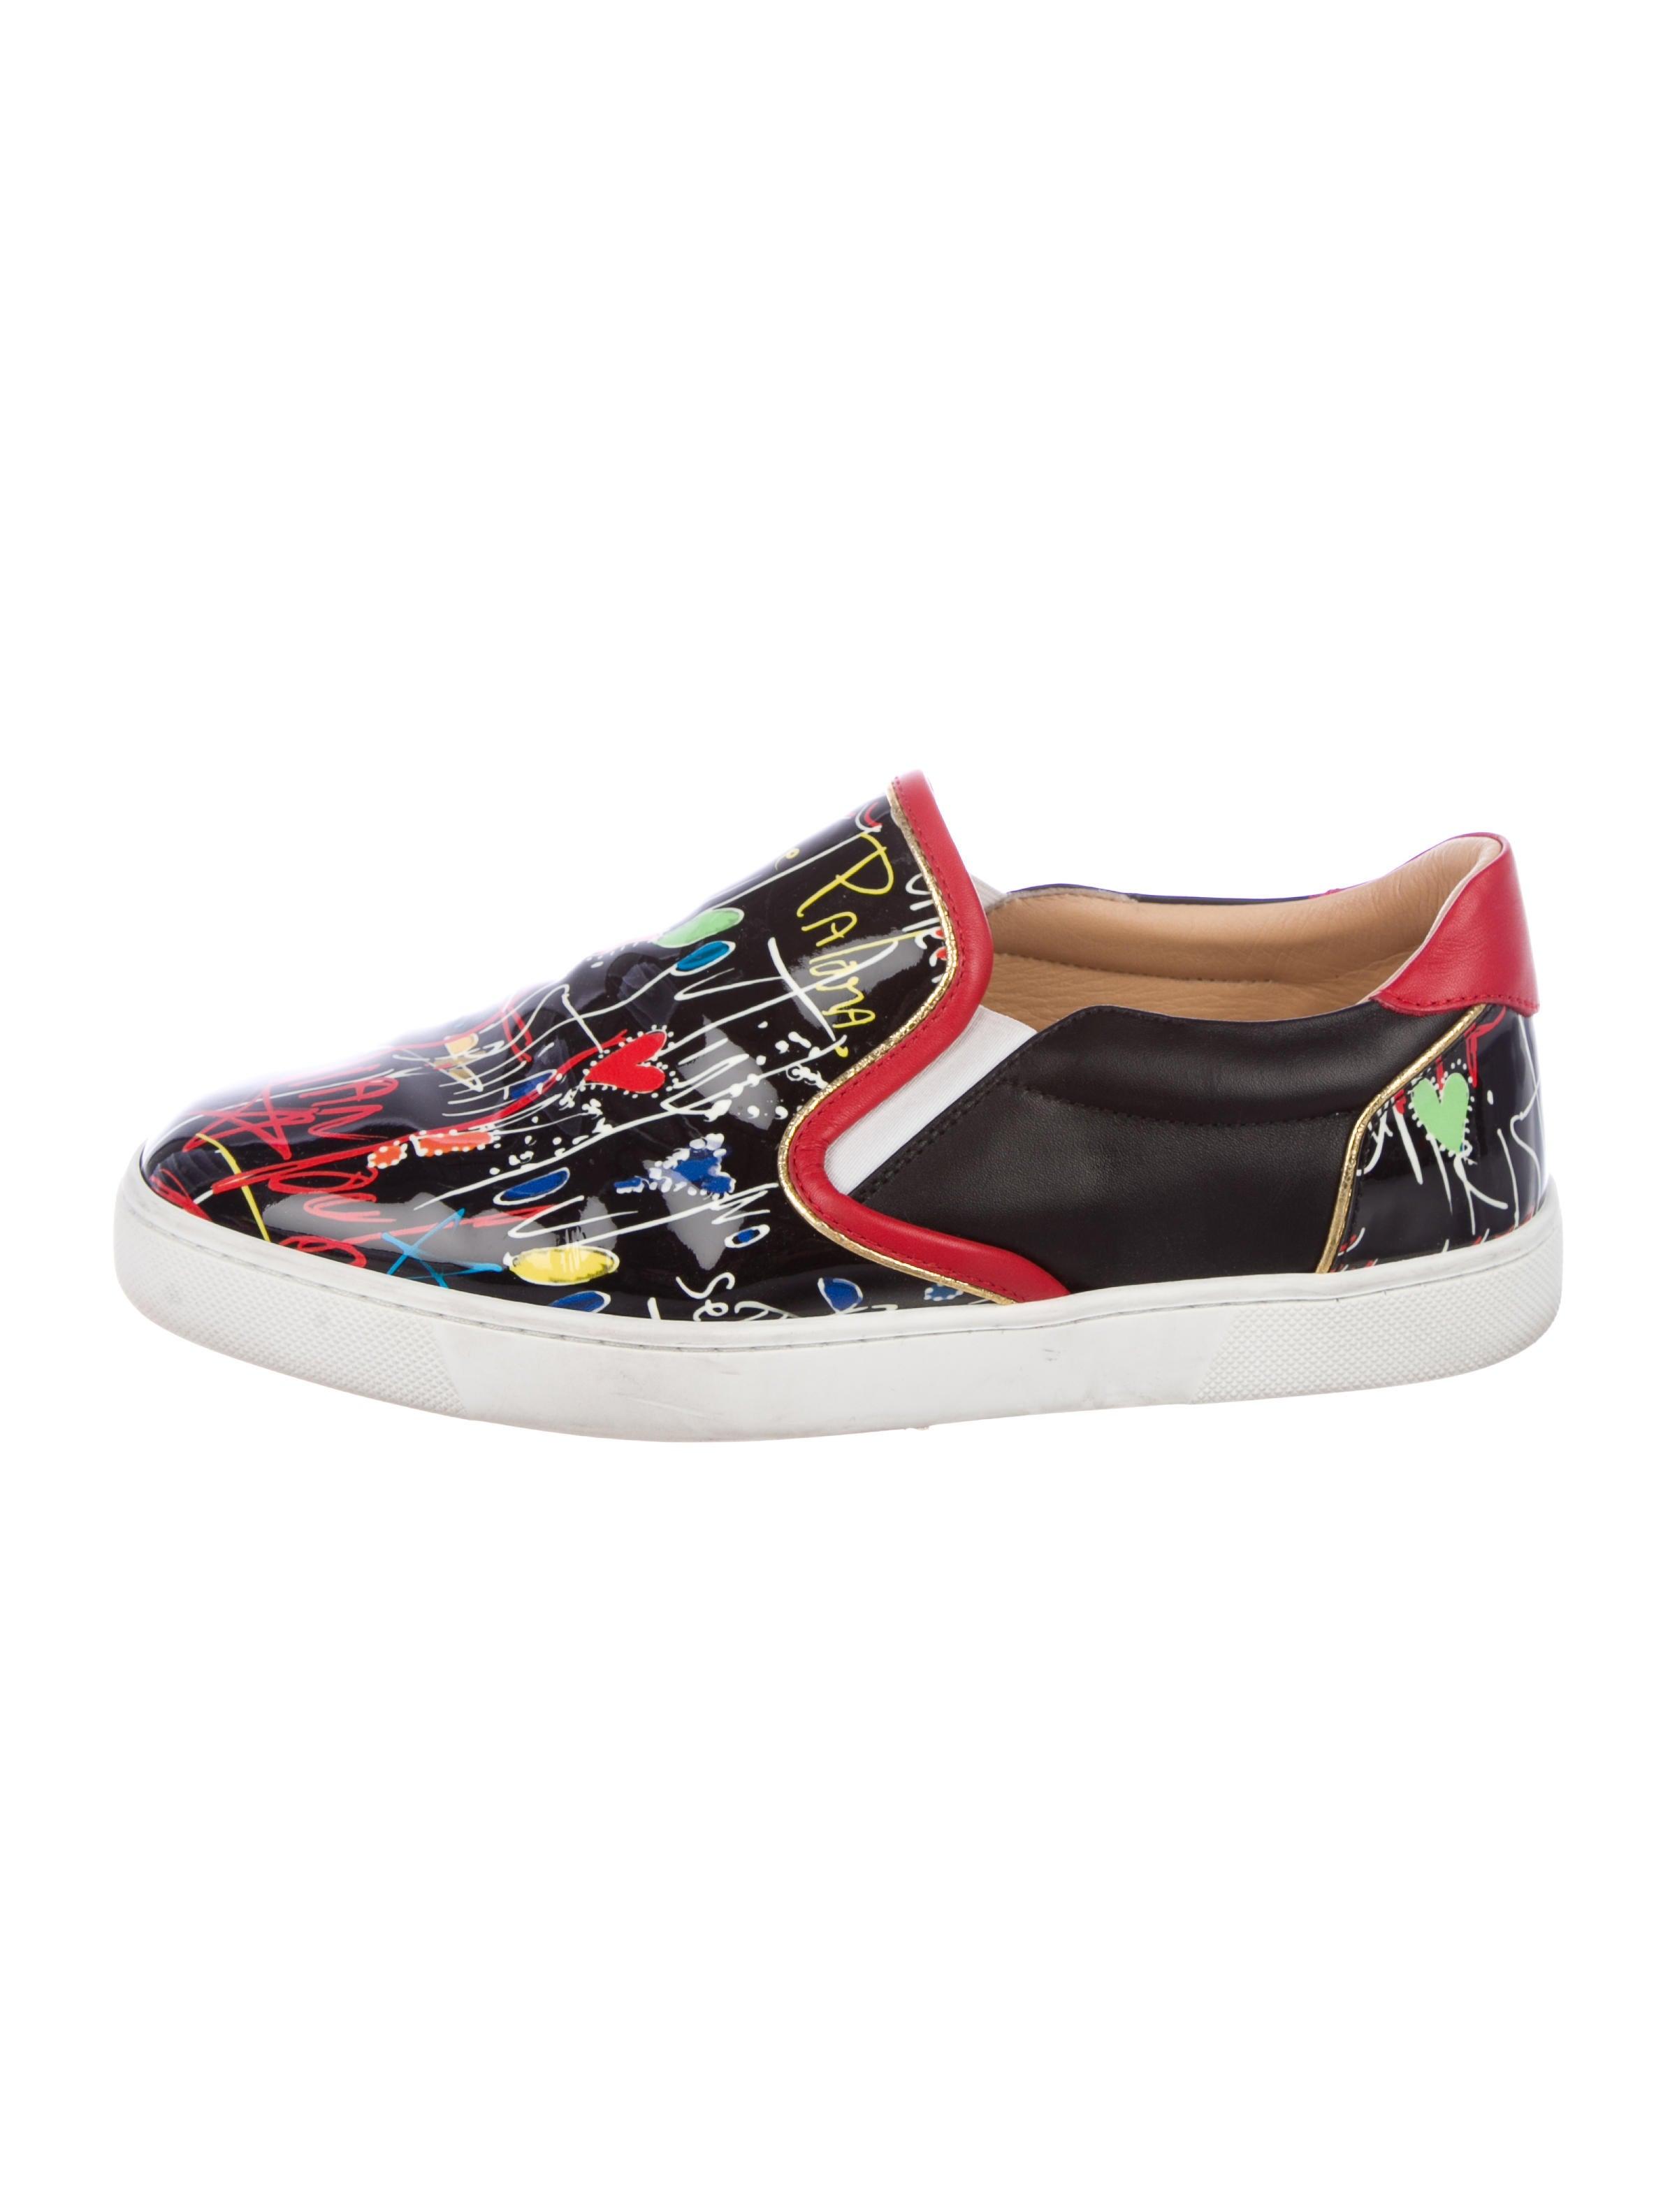 low priced 1b354 1b107 Masteralta Flat Slip-On Sneakers